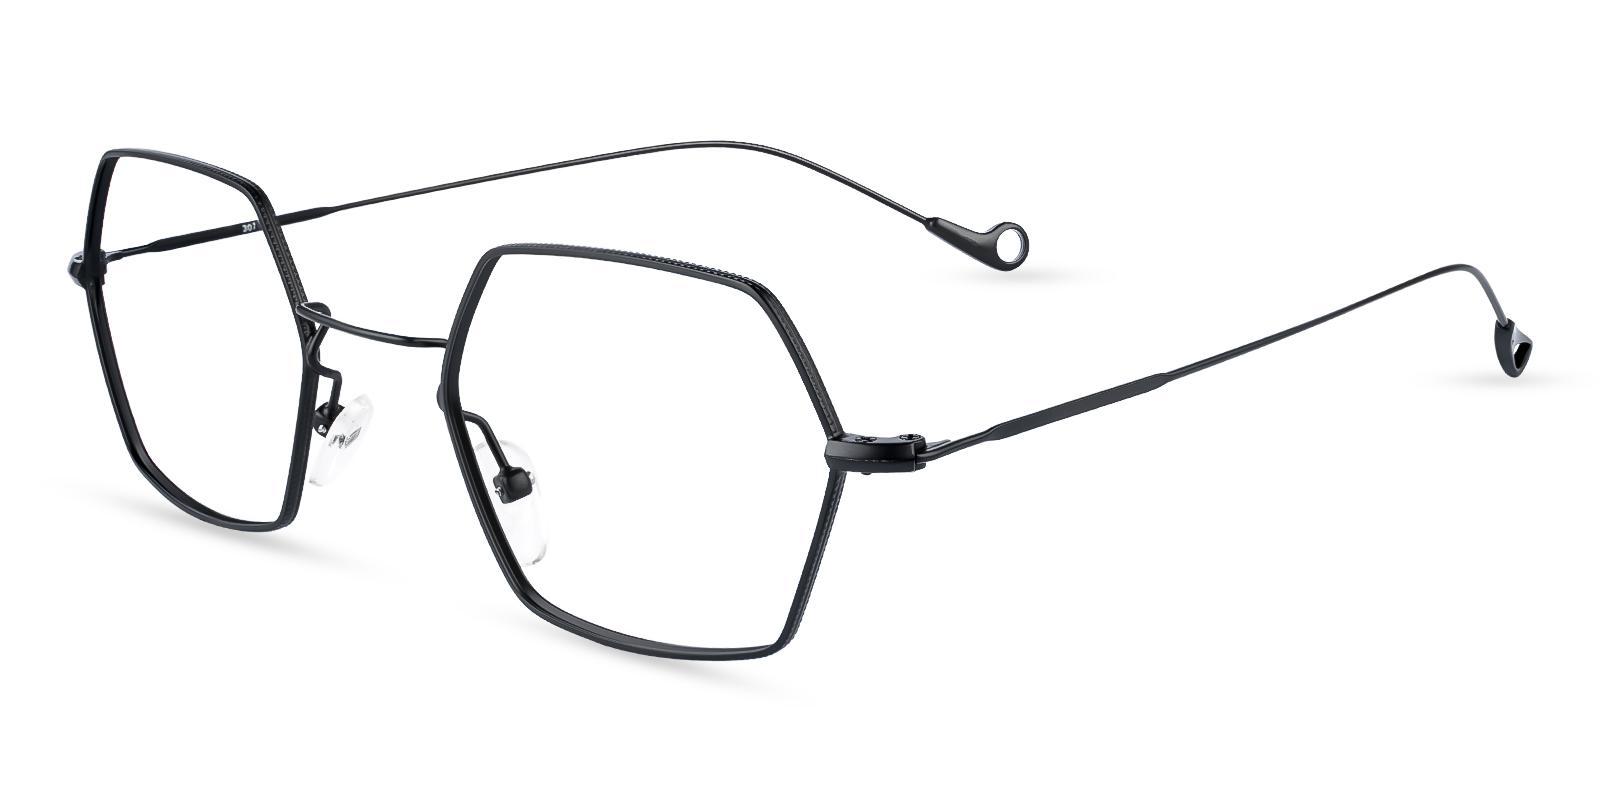 Crystal Black Metal Eyeglasses , NosePads Frames from ABBE Glasses